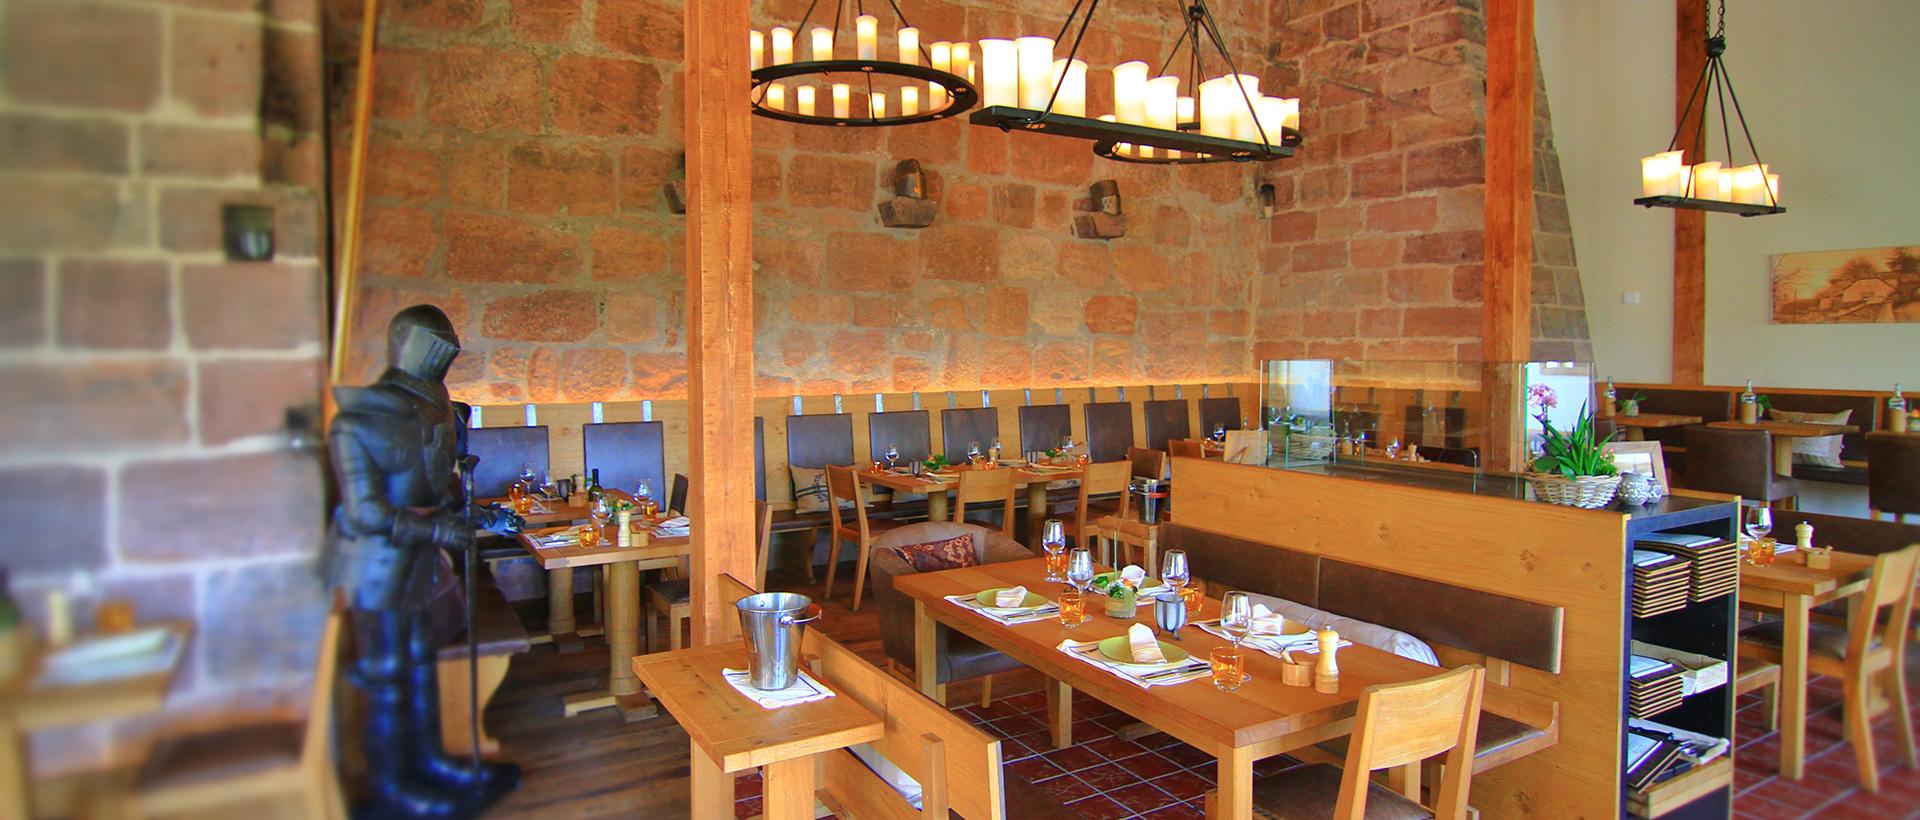 Restaurant Bückingsgarten Innenansicht